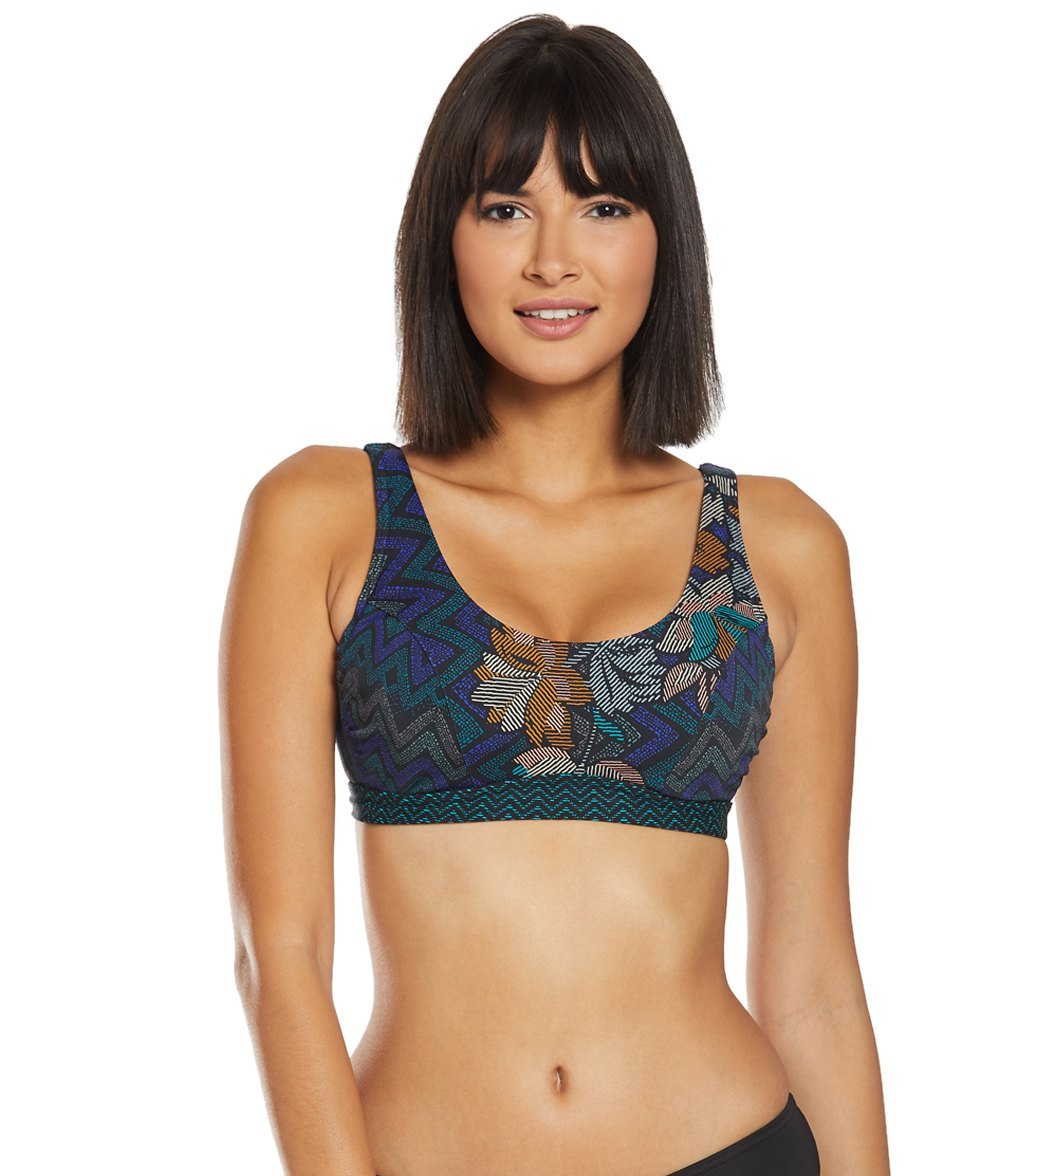 07f8b24b5 Prana Horchata Abella Bikini Top (D-Cup) at SwimOutlet.com - Free Shipping